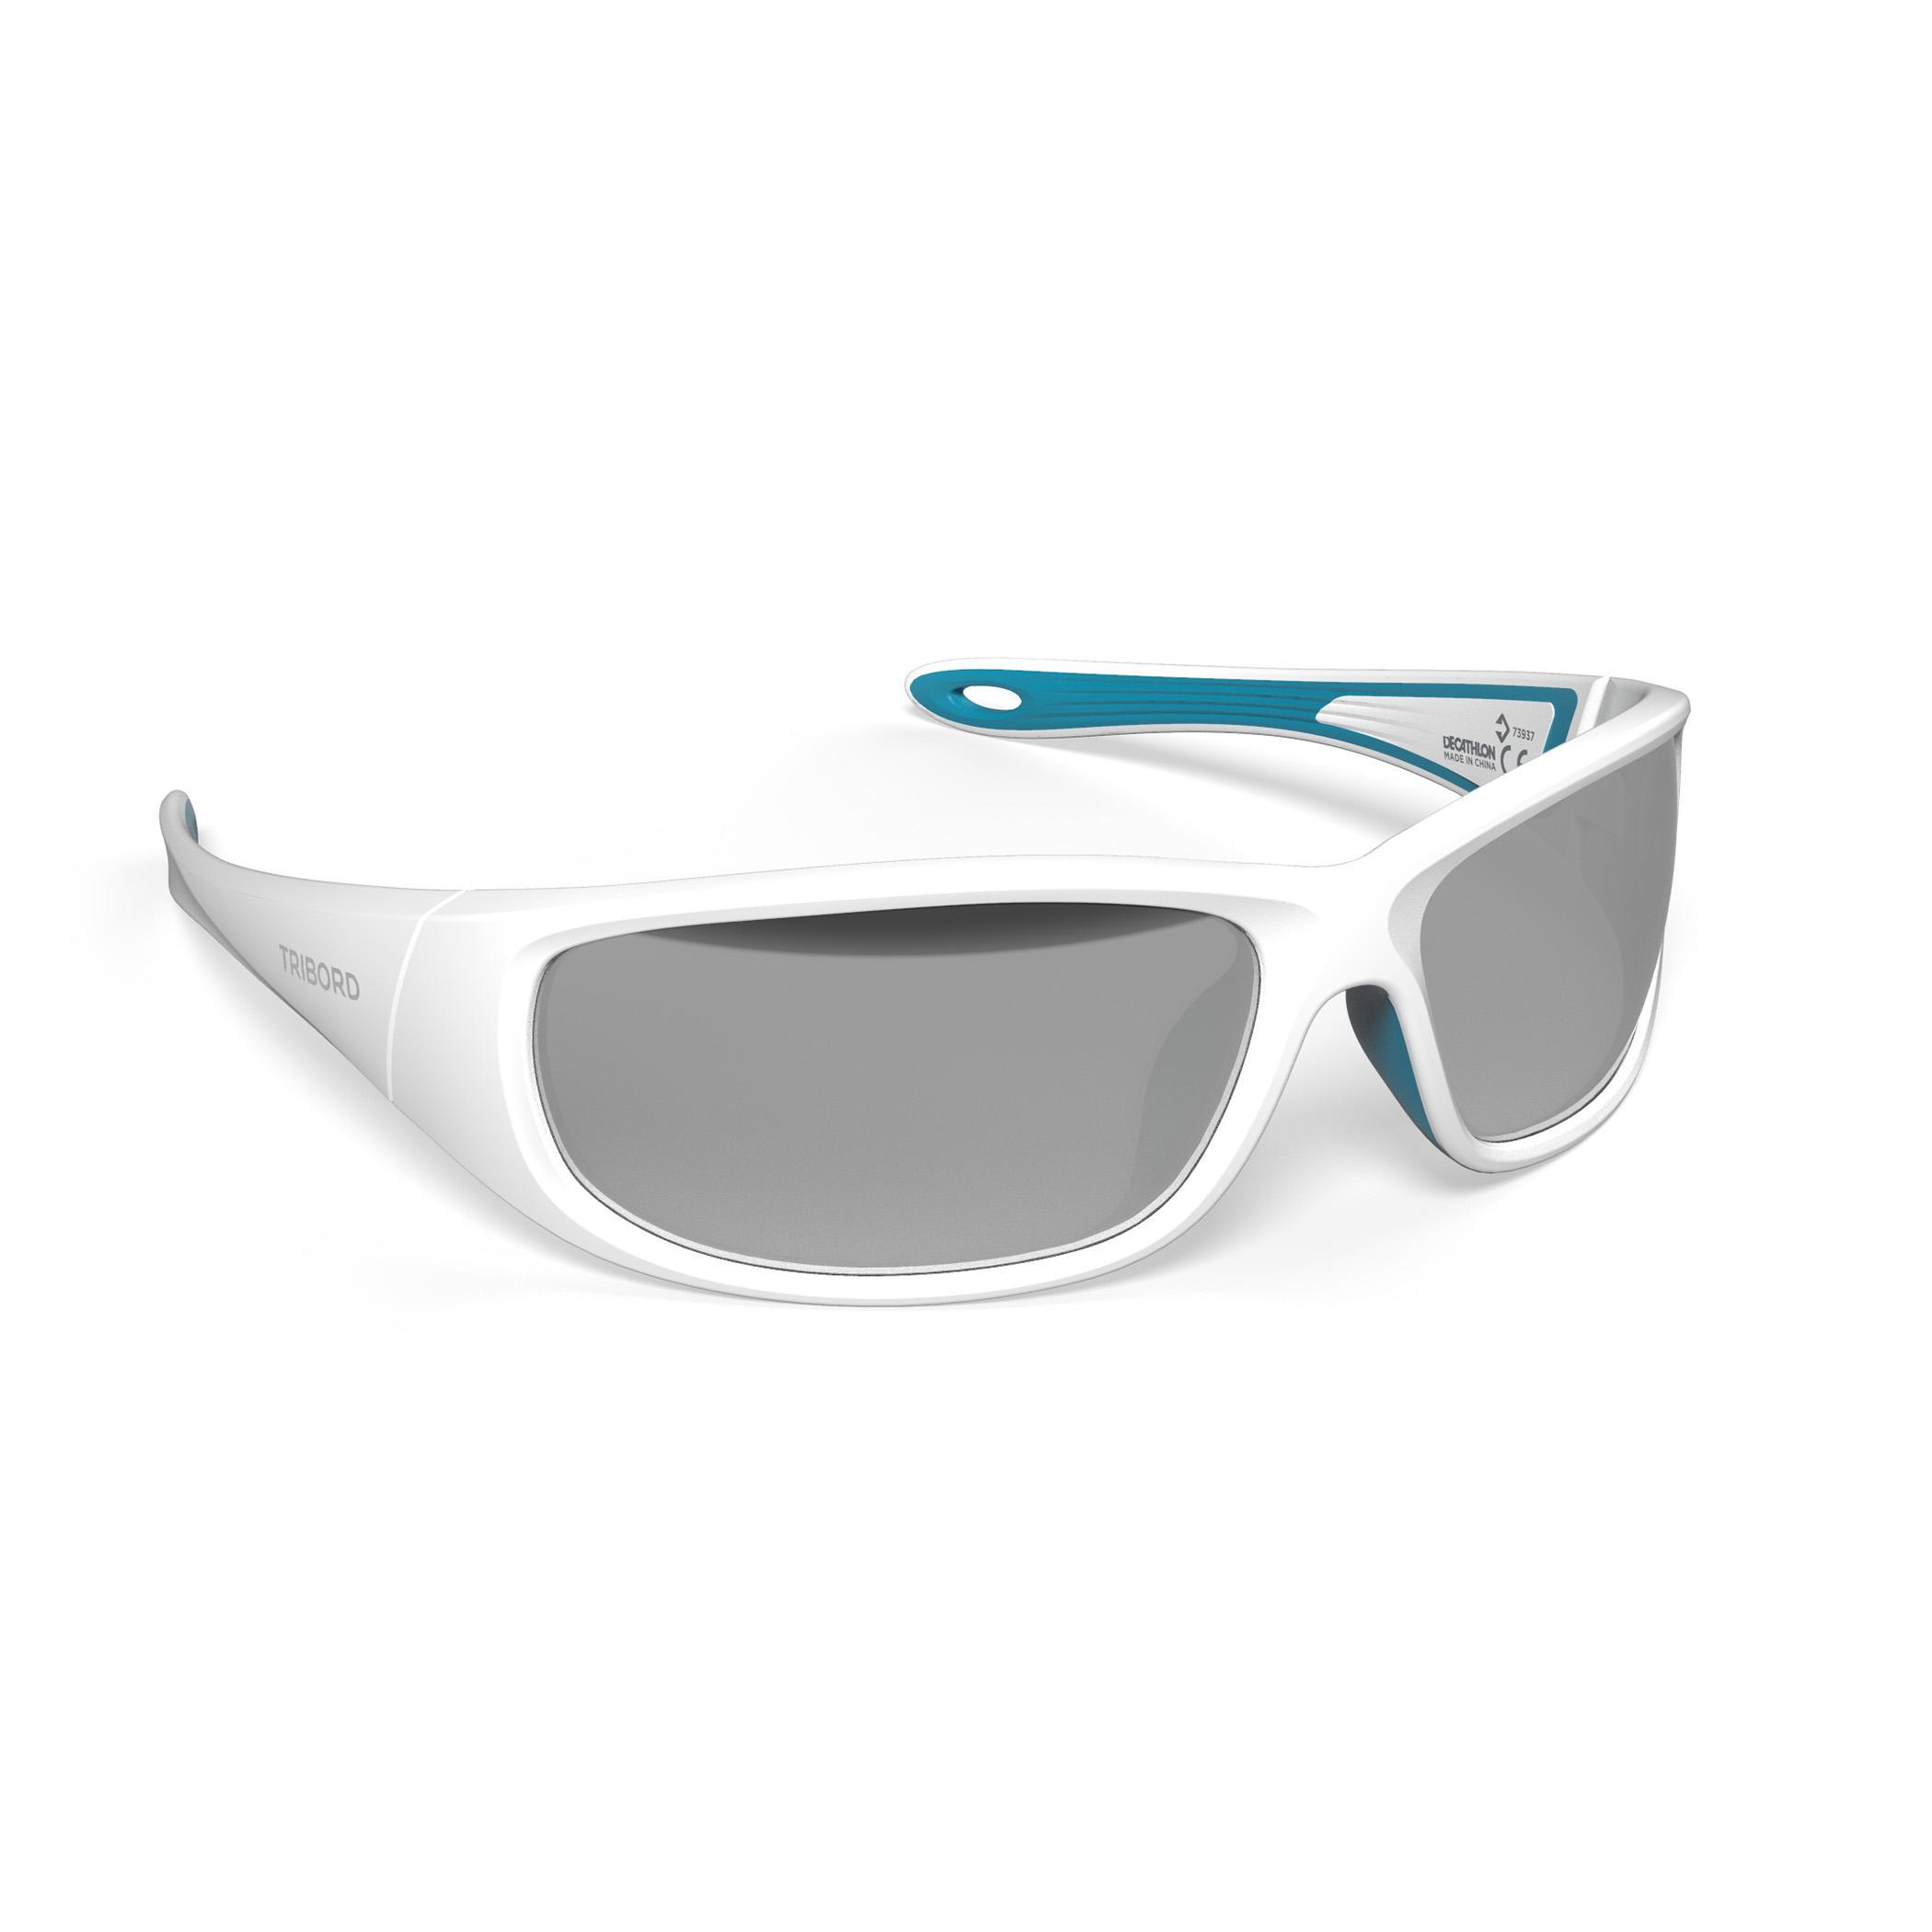 1828bf31af6277 Tribord Watersportbril 900 voor volwassenen wit